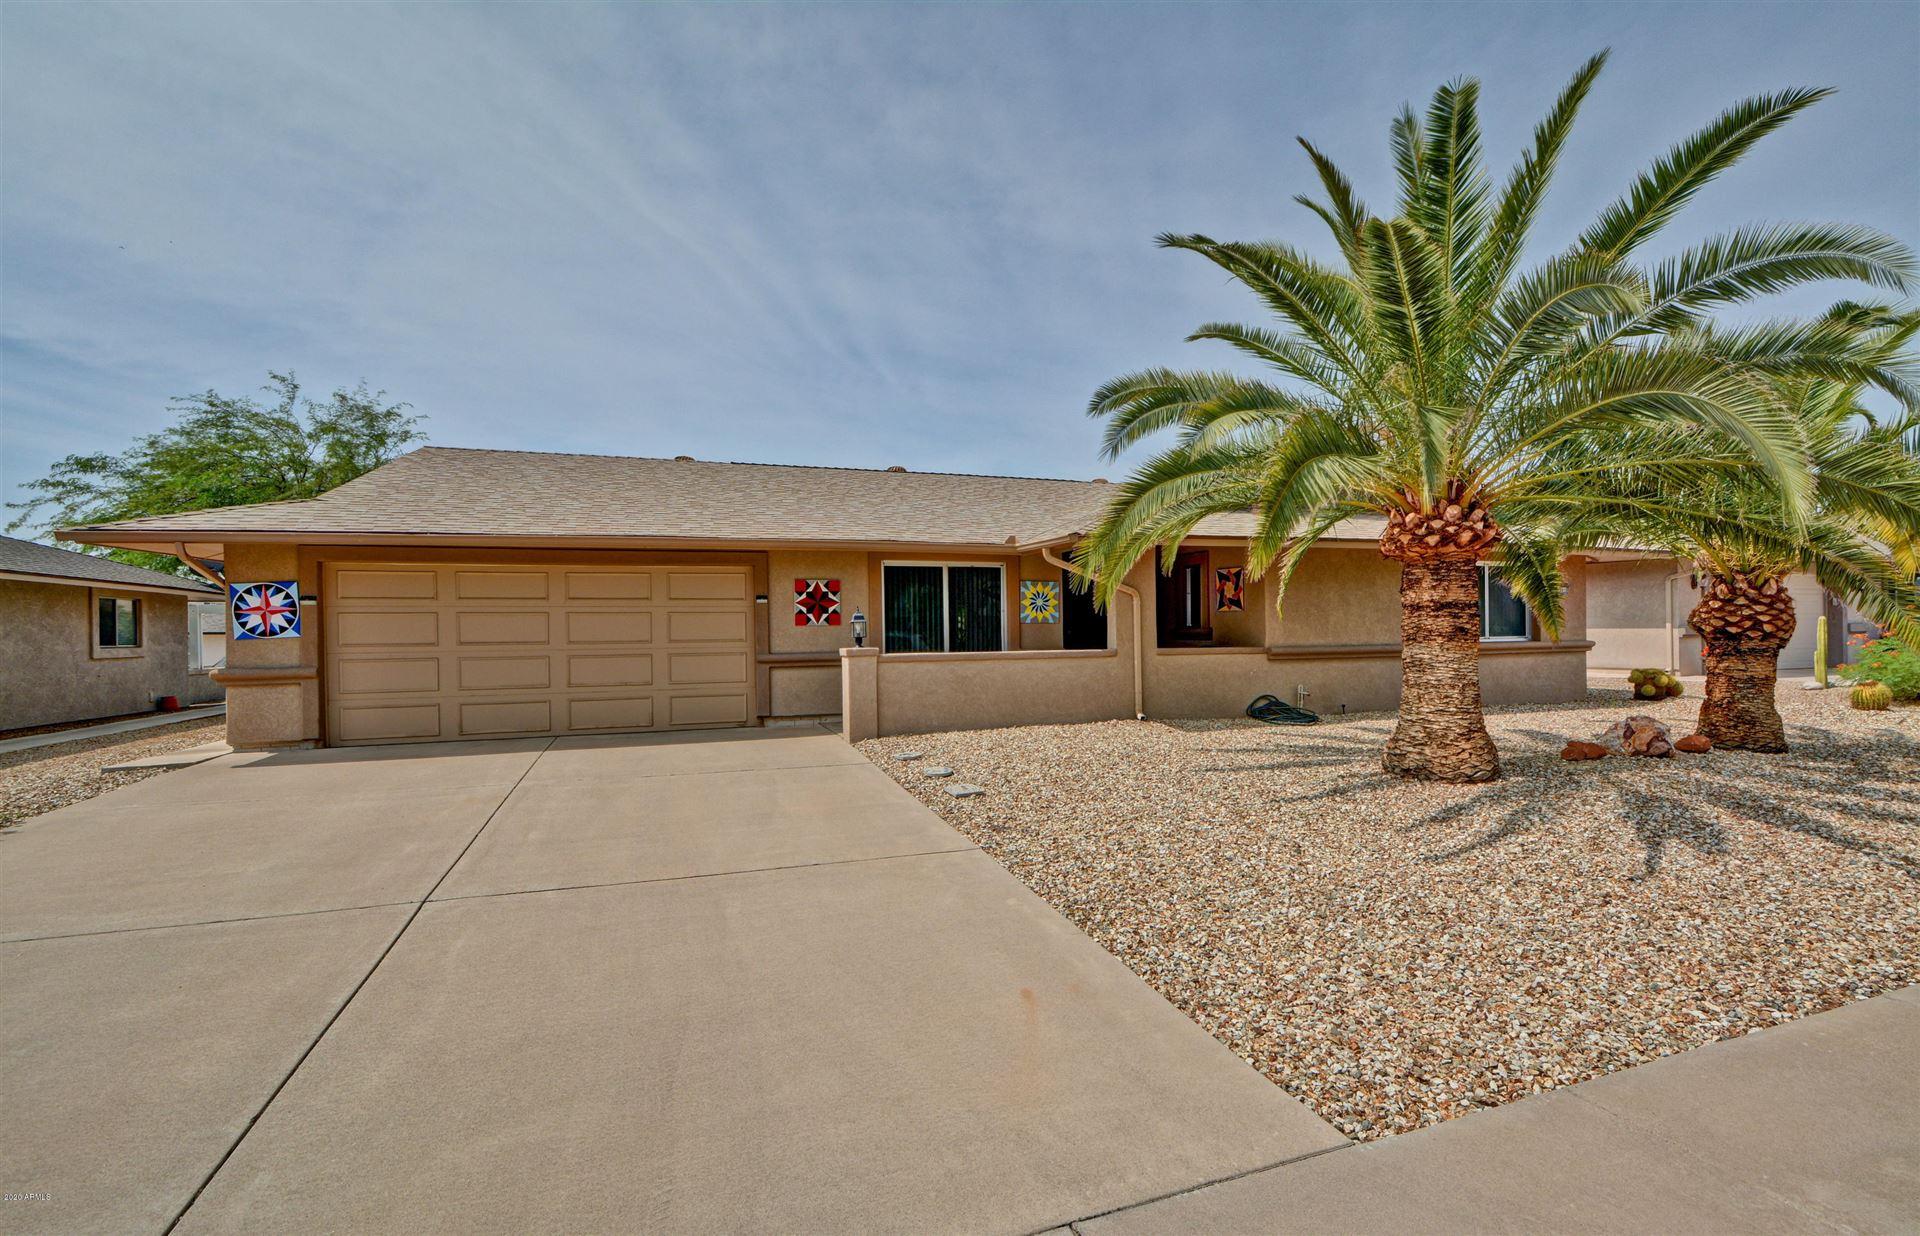 18018 N 129TH Drive, Sun City West, AZ 85375 - MLS#: 6131828